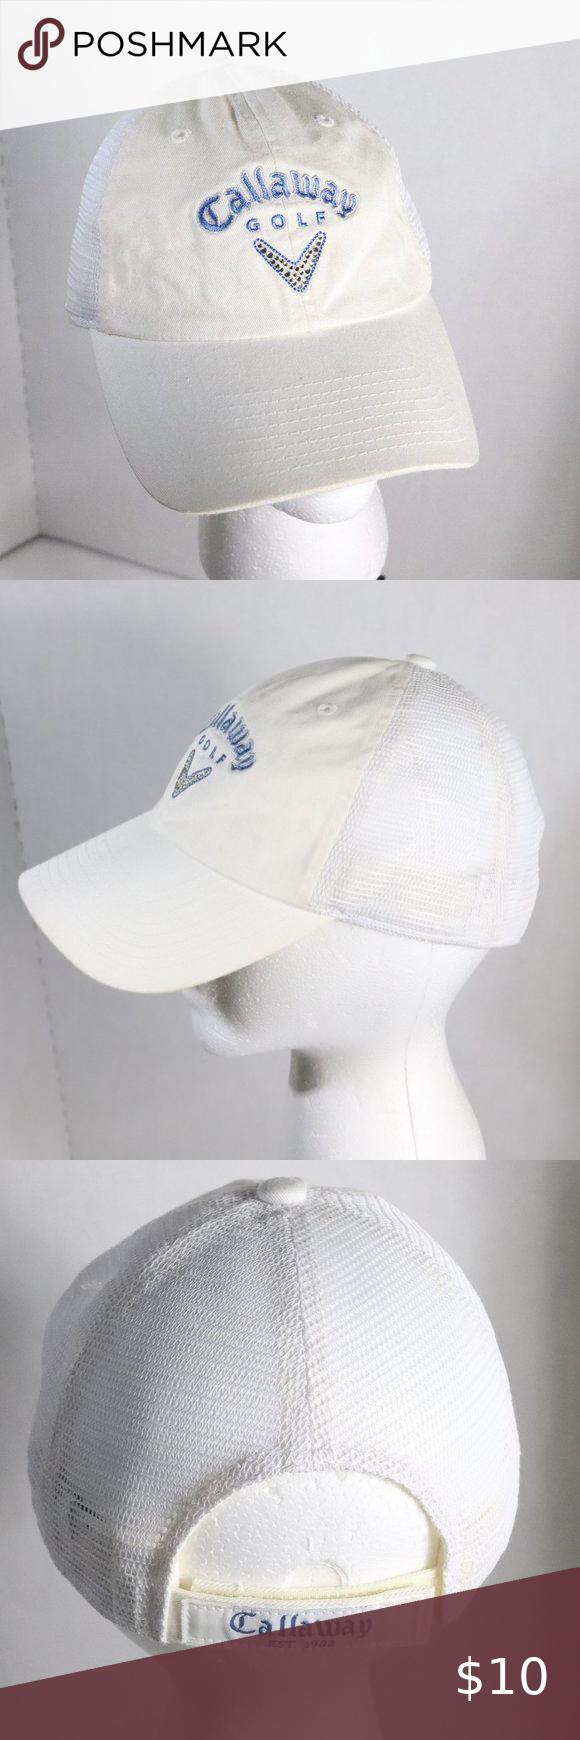 Callaway Golf White Hat With Sparkles Callaway Golf White Hat With Sparkles One Size Fits All Very Clean Hook Loop Closure W In 2020 Callaway Golf Callaway White Hat